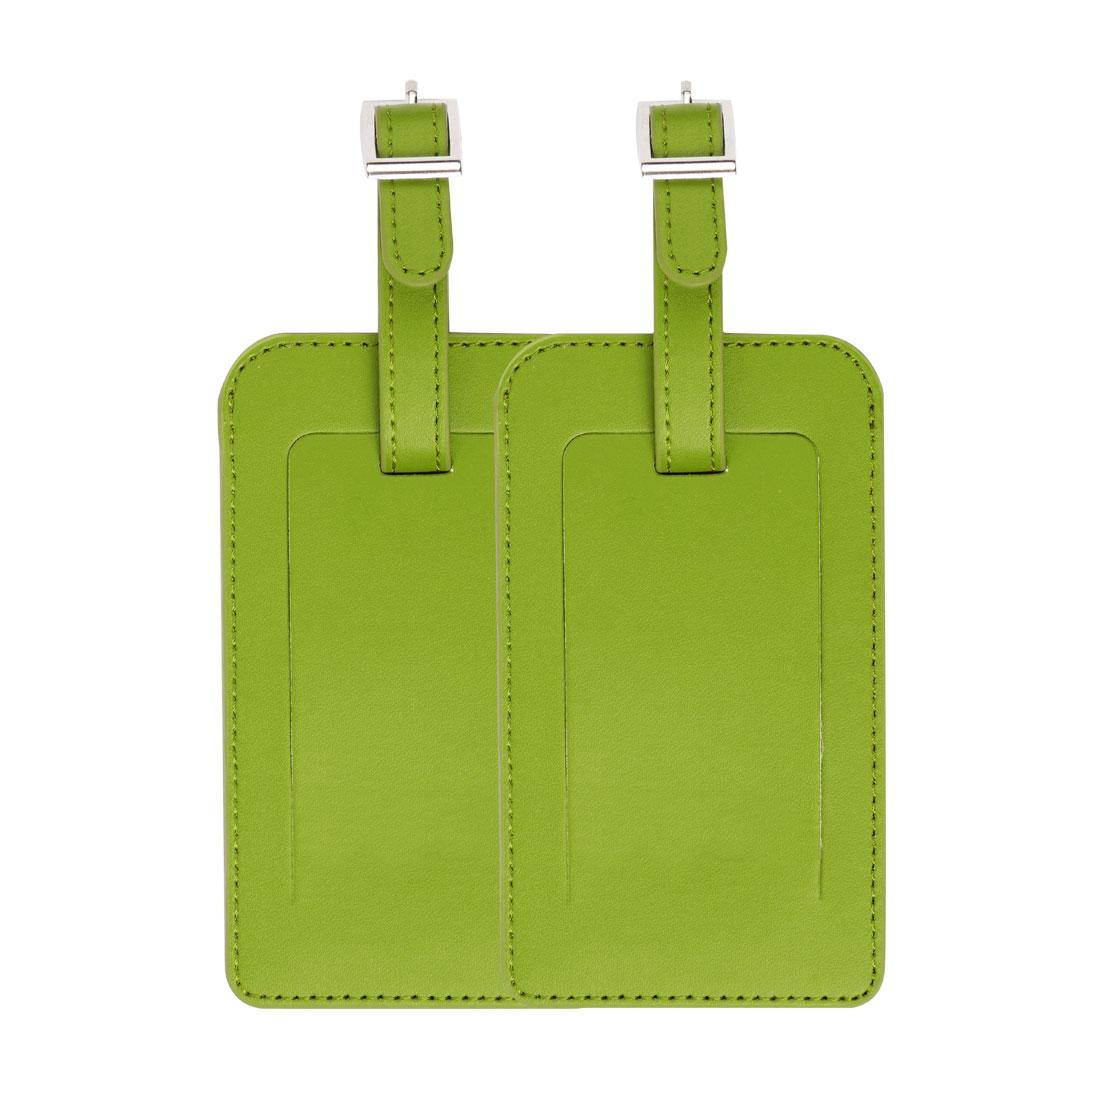 PU Leather Luggage Suitcase Name Address Message Tags ID Label Lemon Green 2pcs